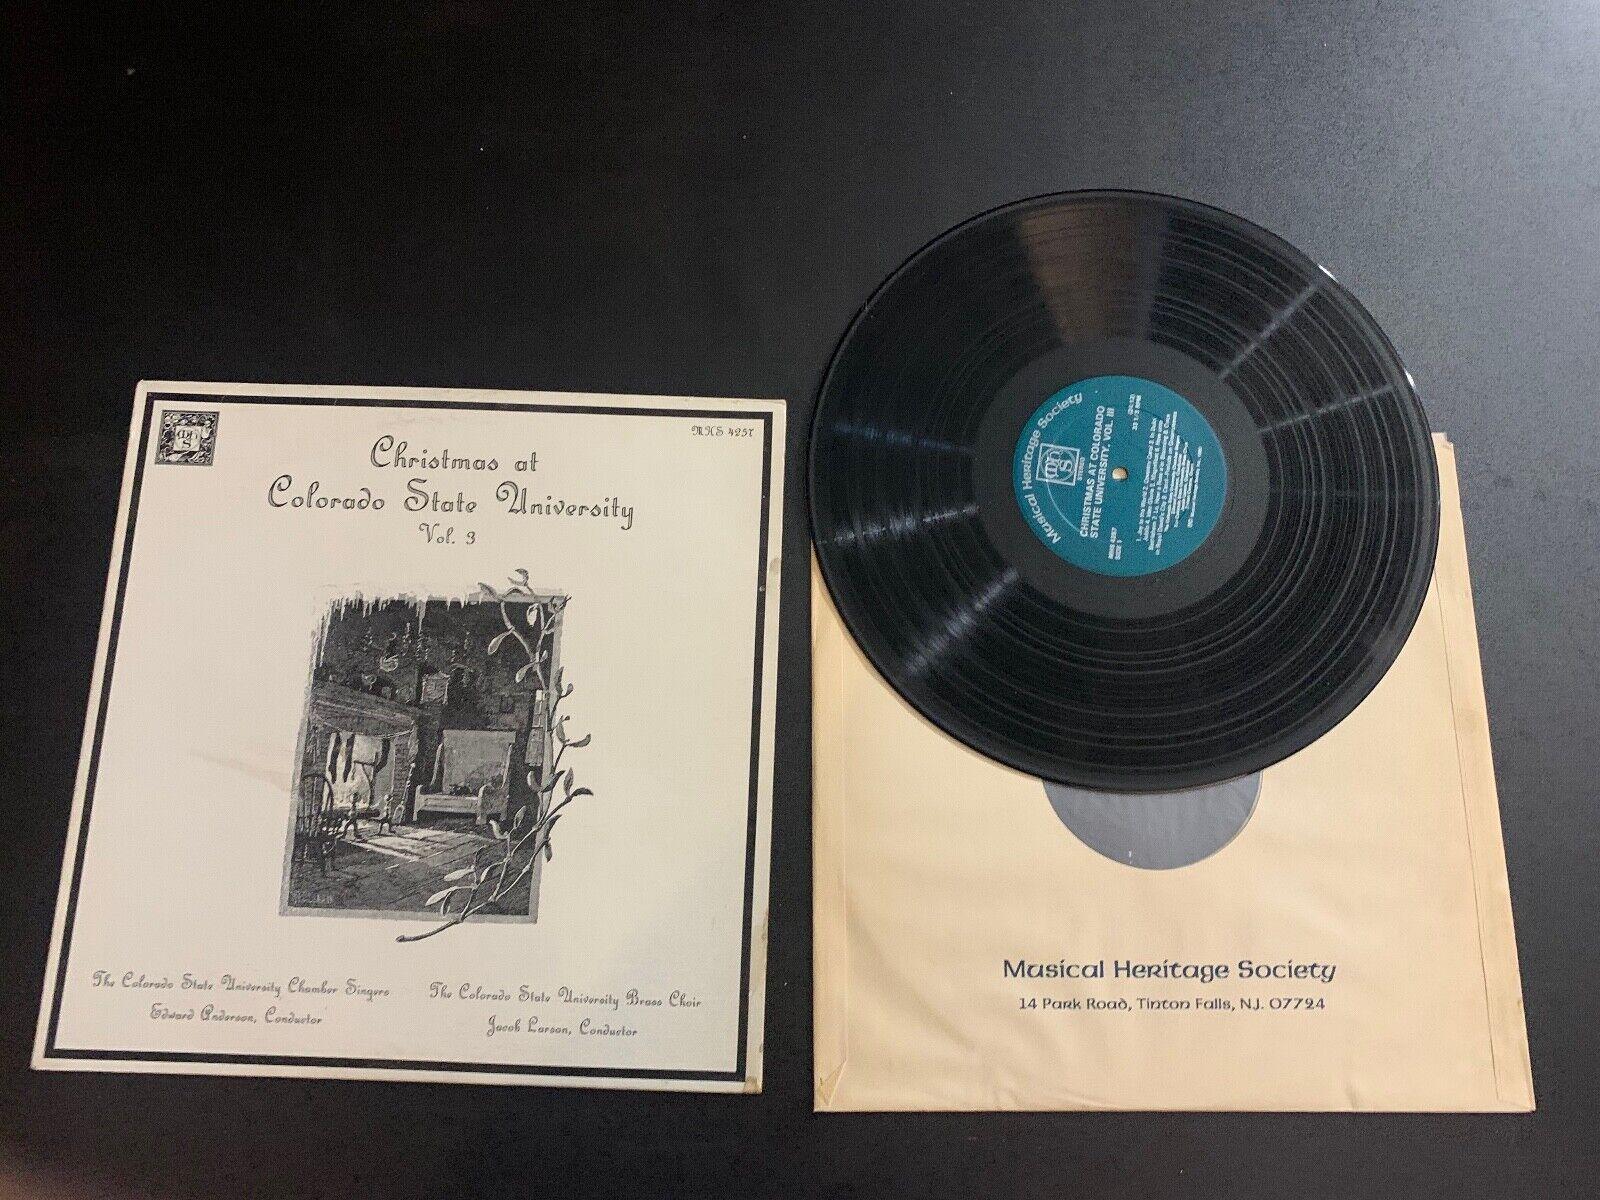 LP RECORD - MHS - CHRISTMAS AT COLORADO STATE UNIVERSITY VOL 3  - $9.99